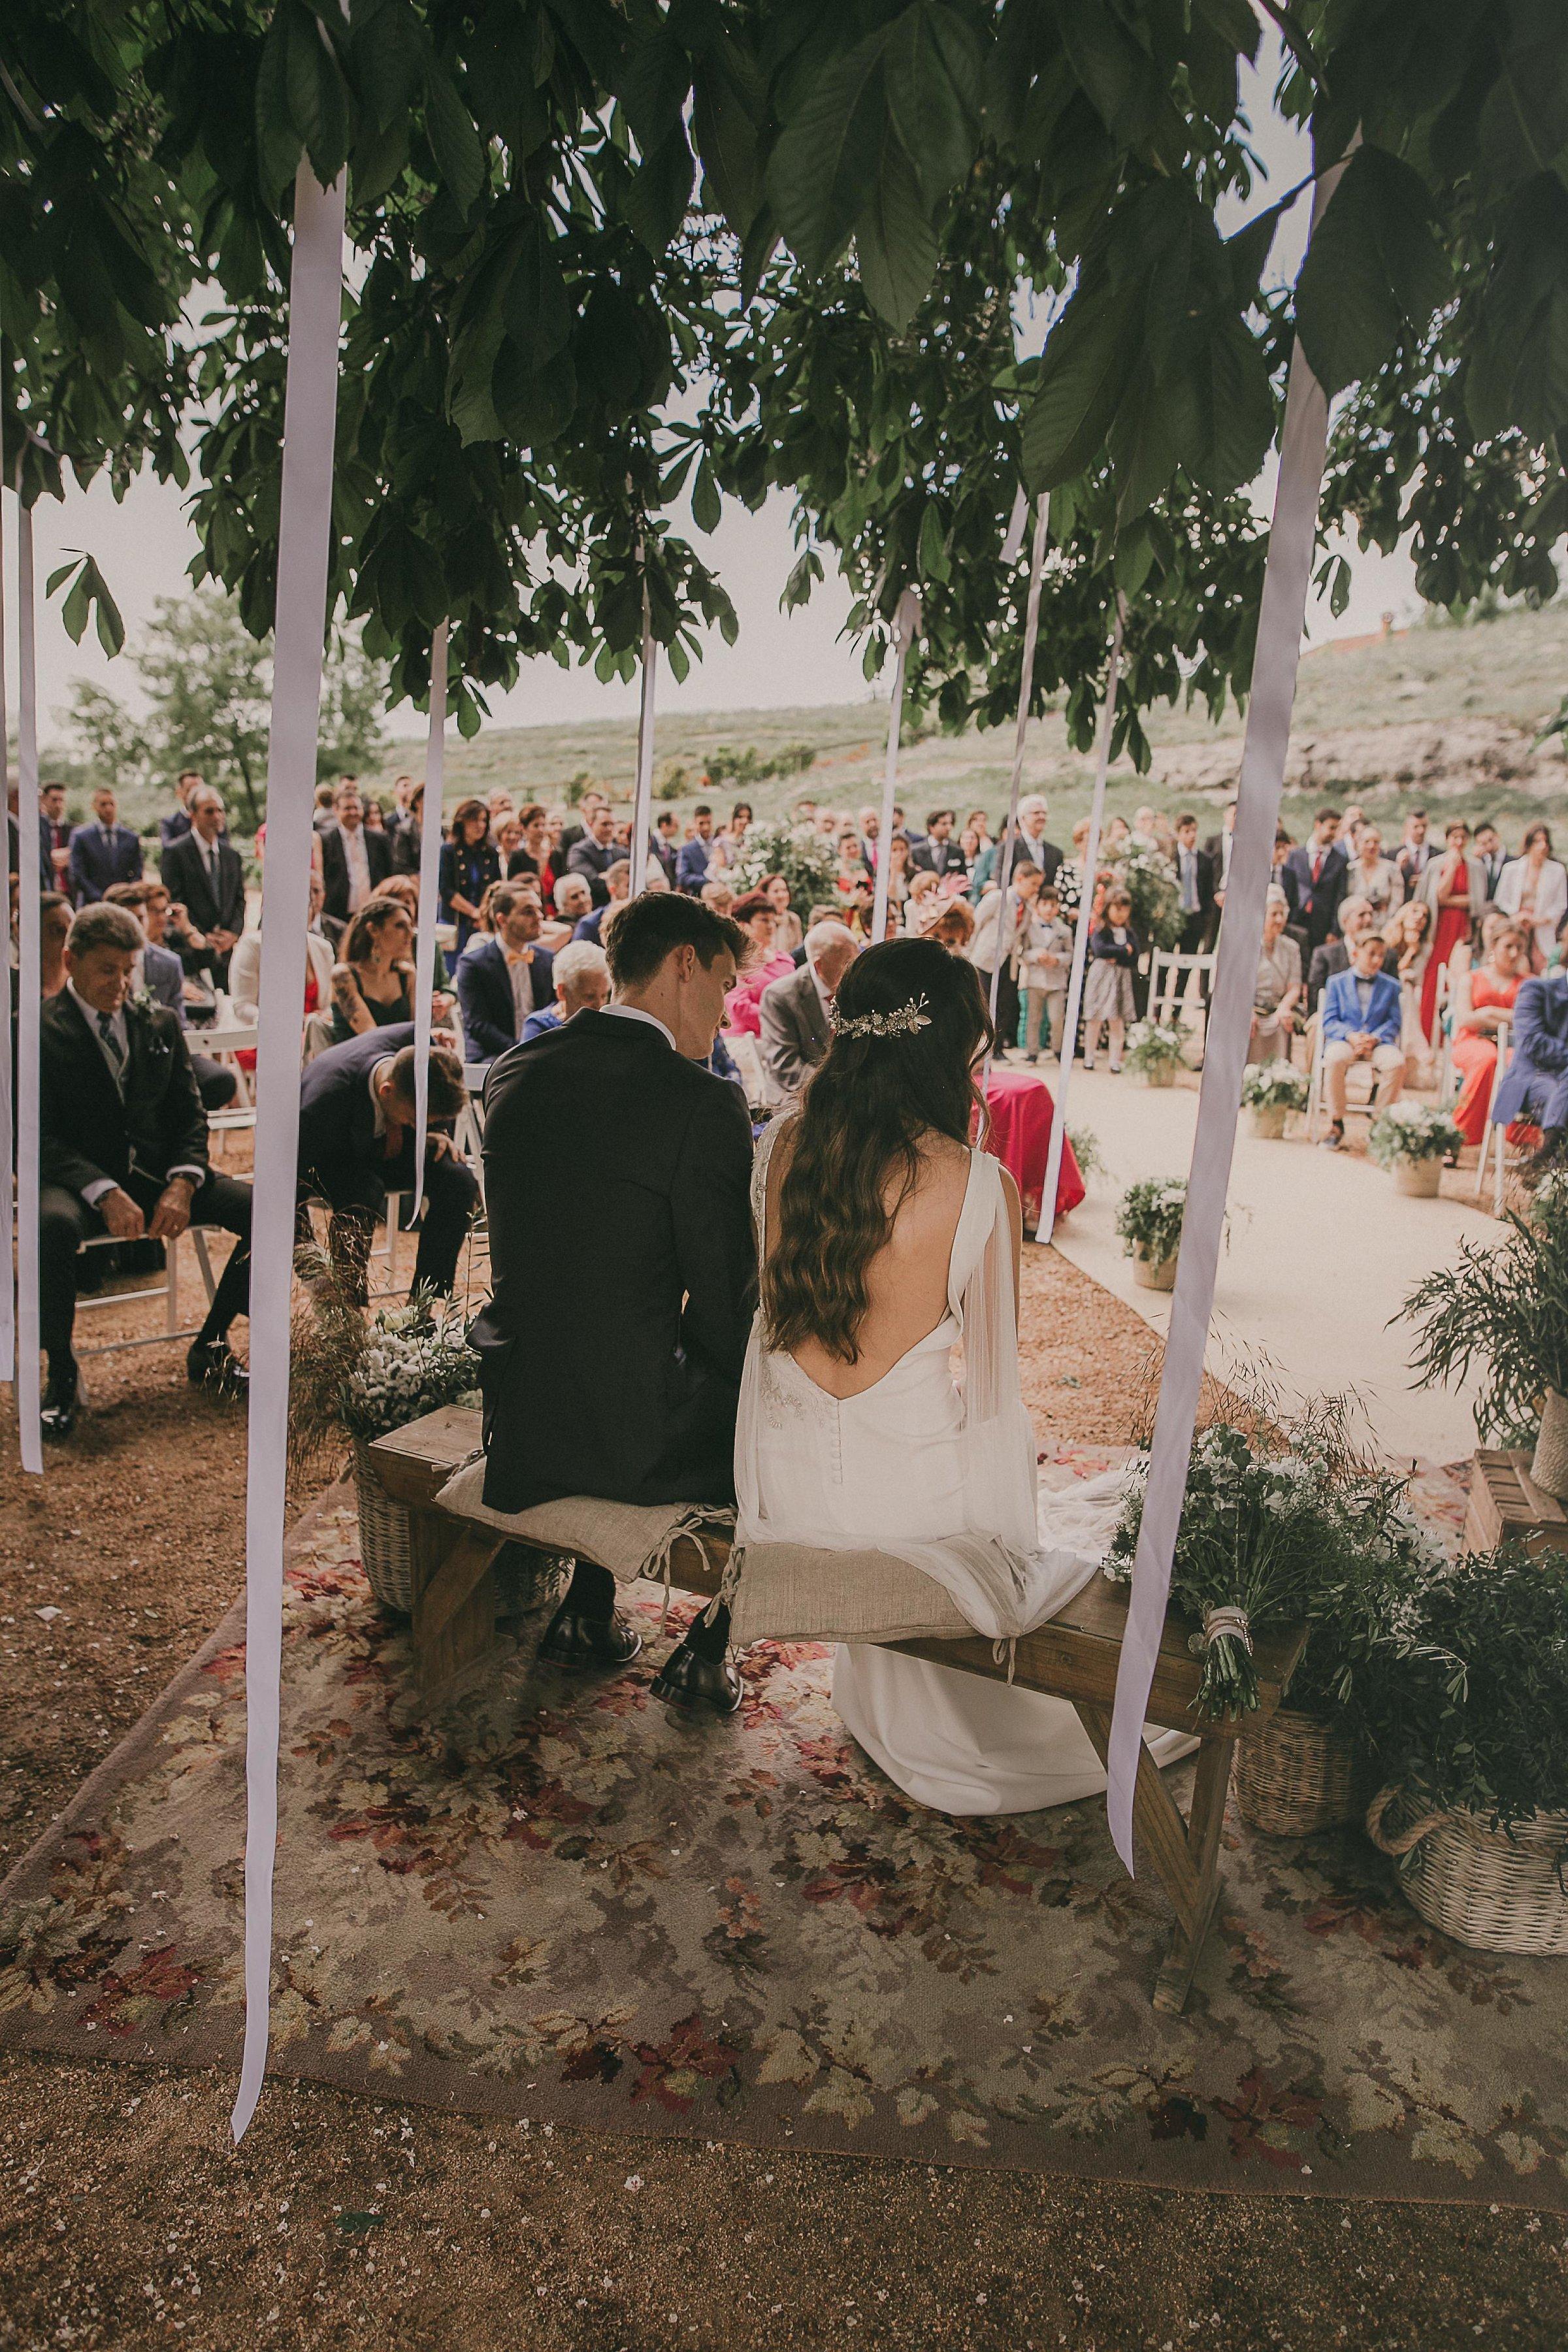 pablolaguiaana-diego-wedding-pablo-laguia-1244